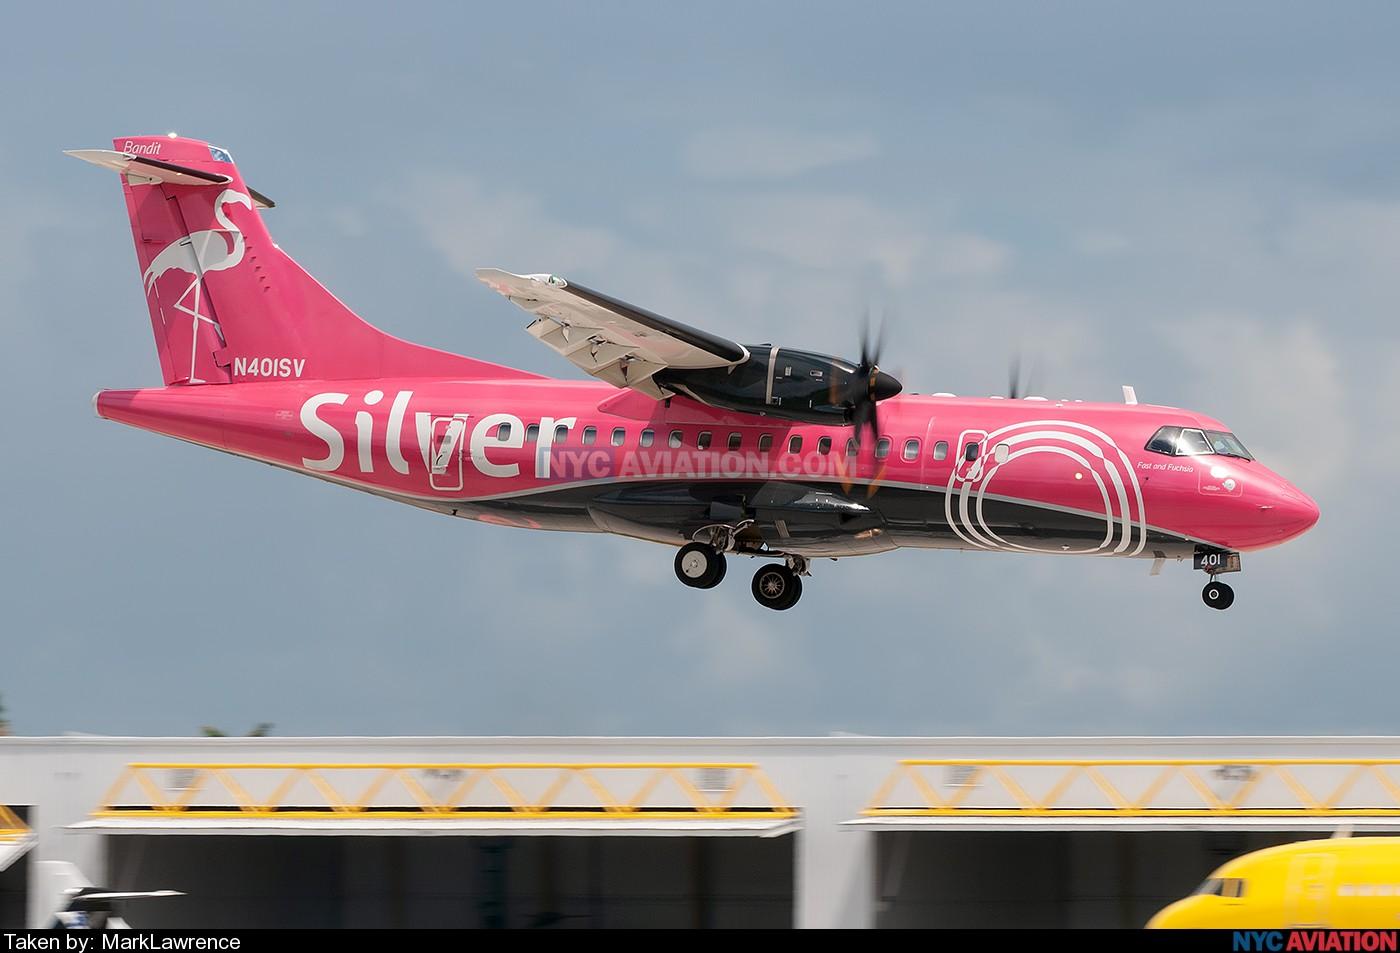 5aao8uwK5d-ATR42-N401SV-KFLL-08222019.jpg